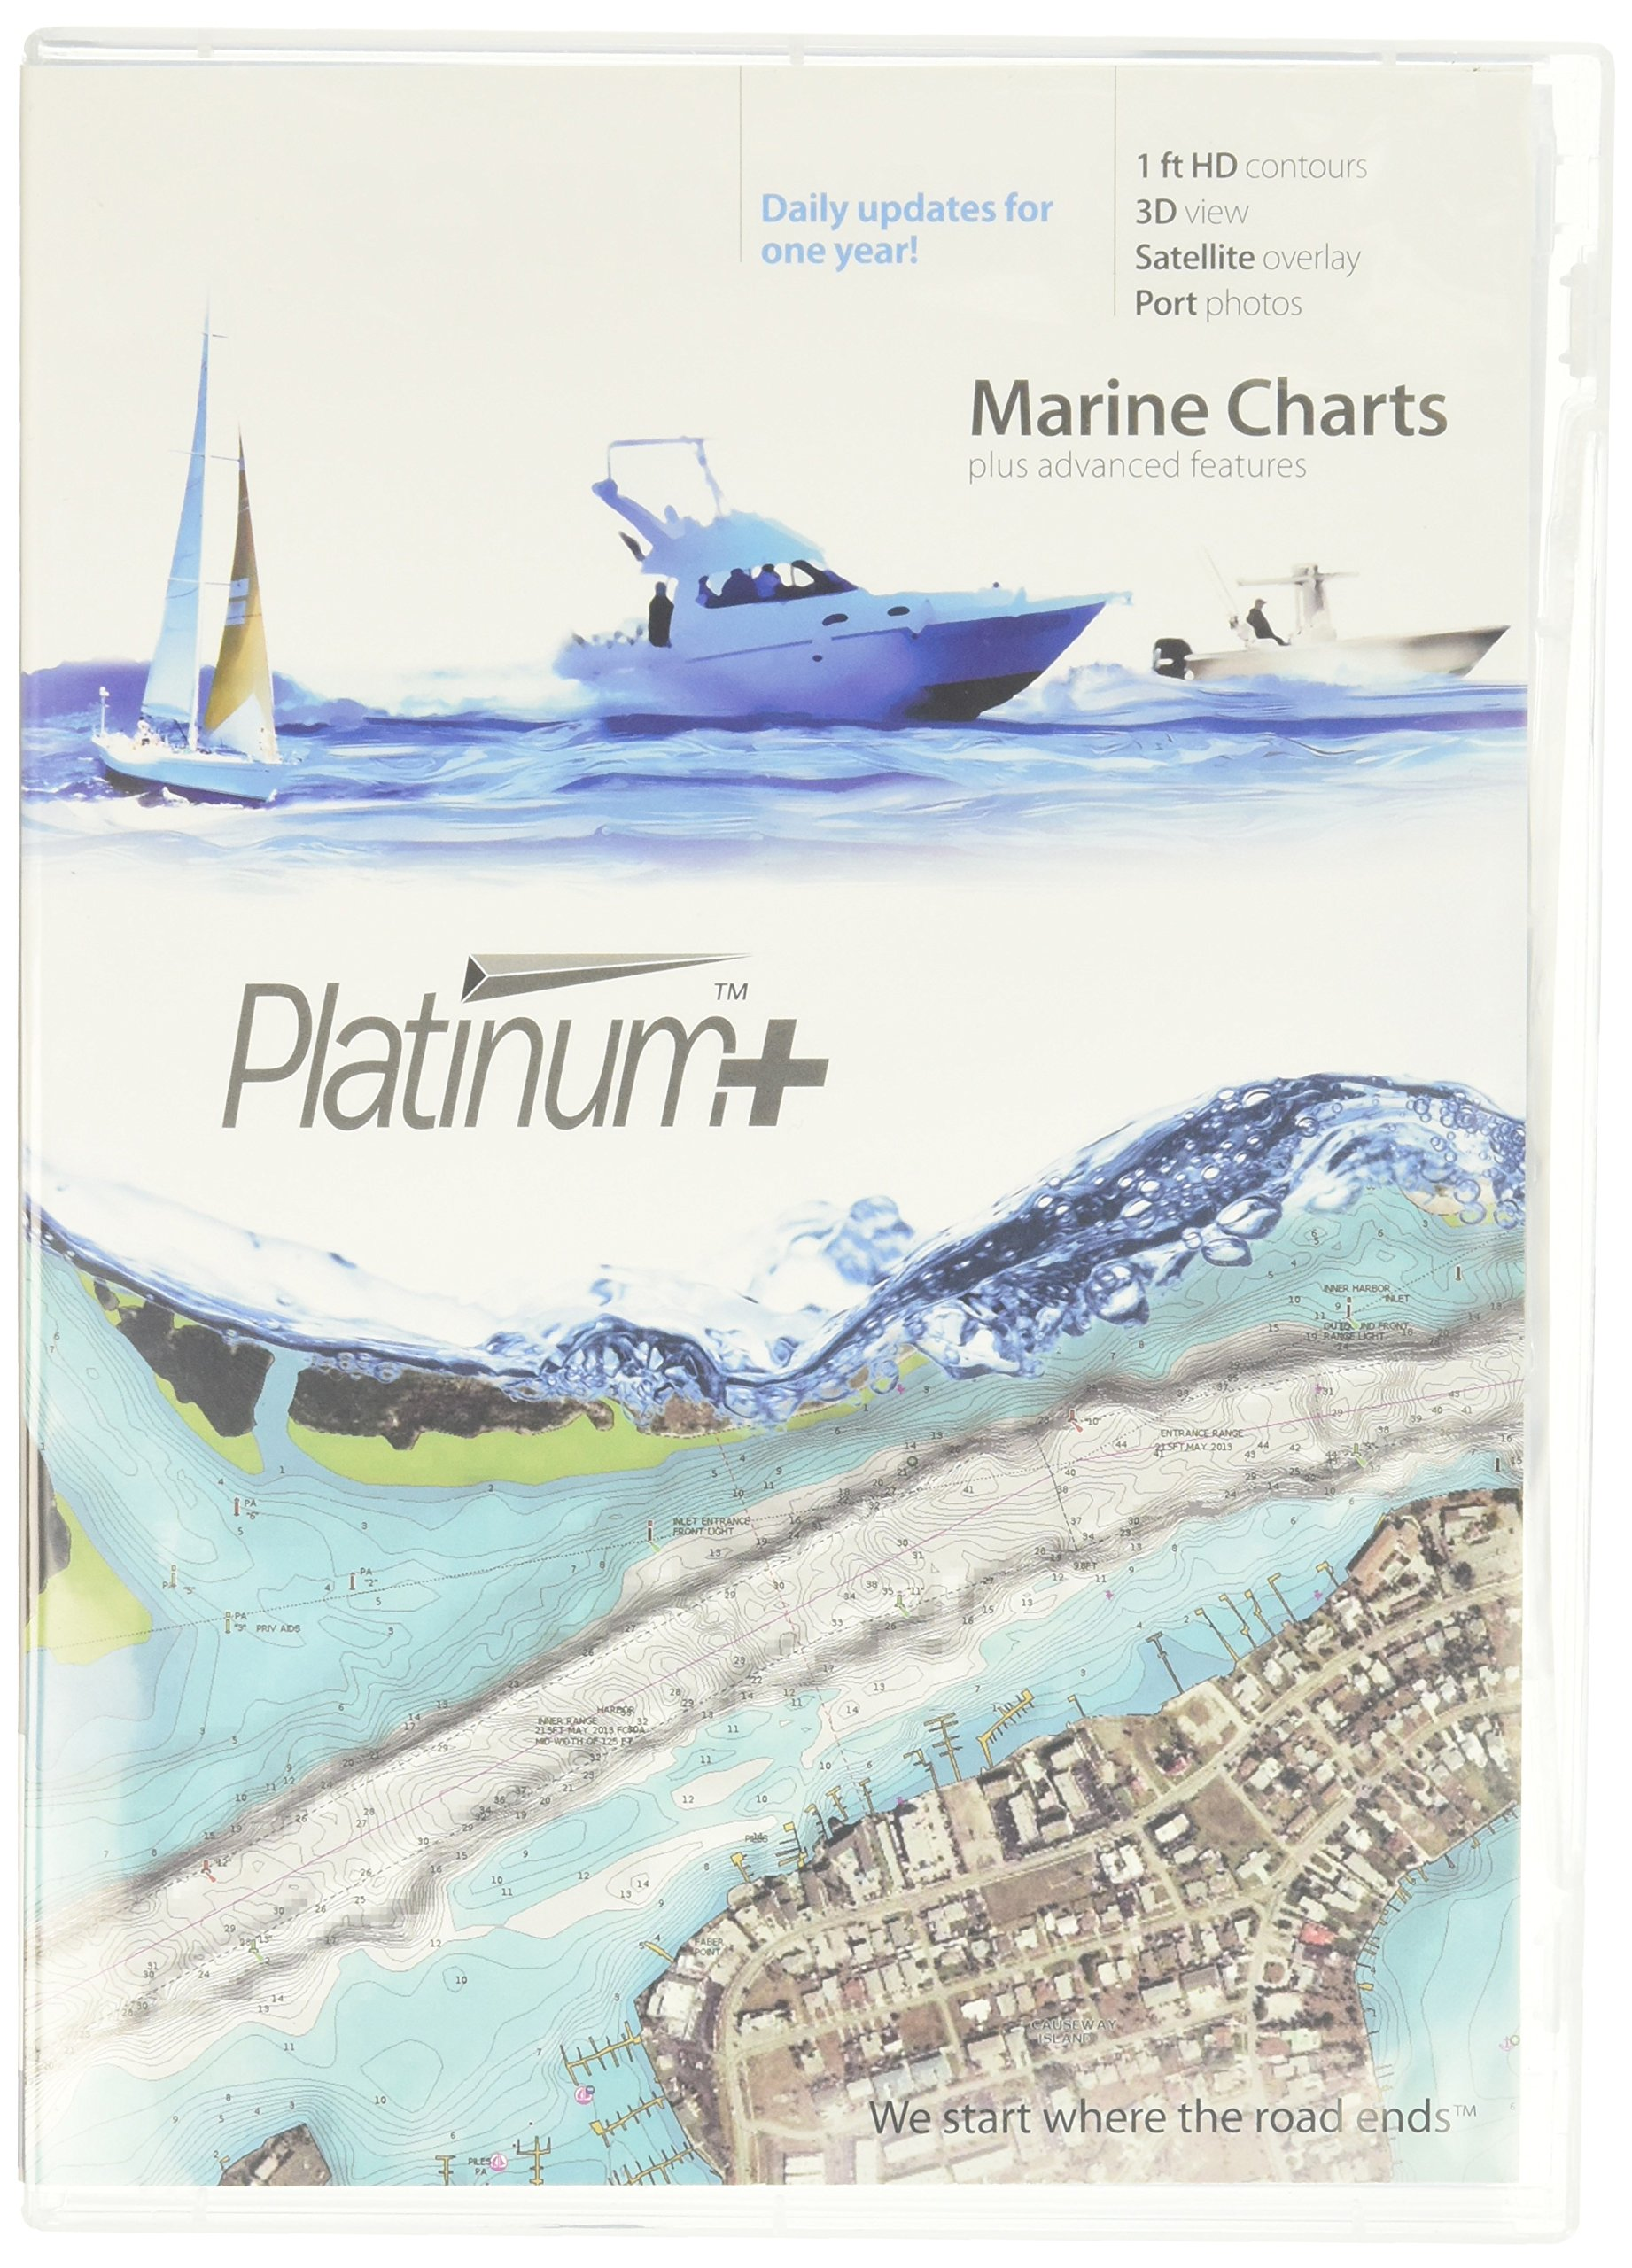 Navionics Platinum+ SD 905 US MID Atlantic & Canyons Nautical Chart on SD/Micro-SD Card - MSD/905P+